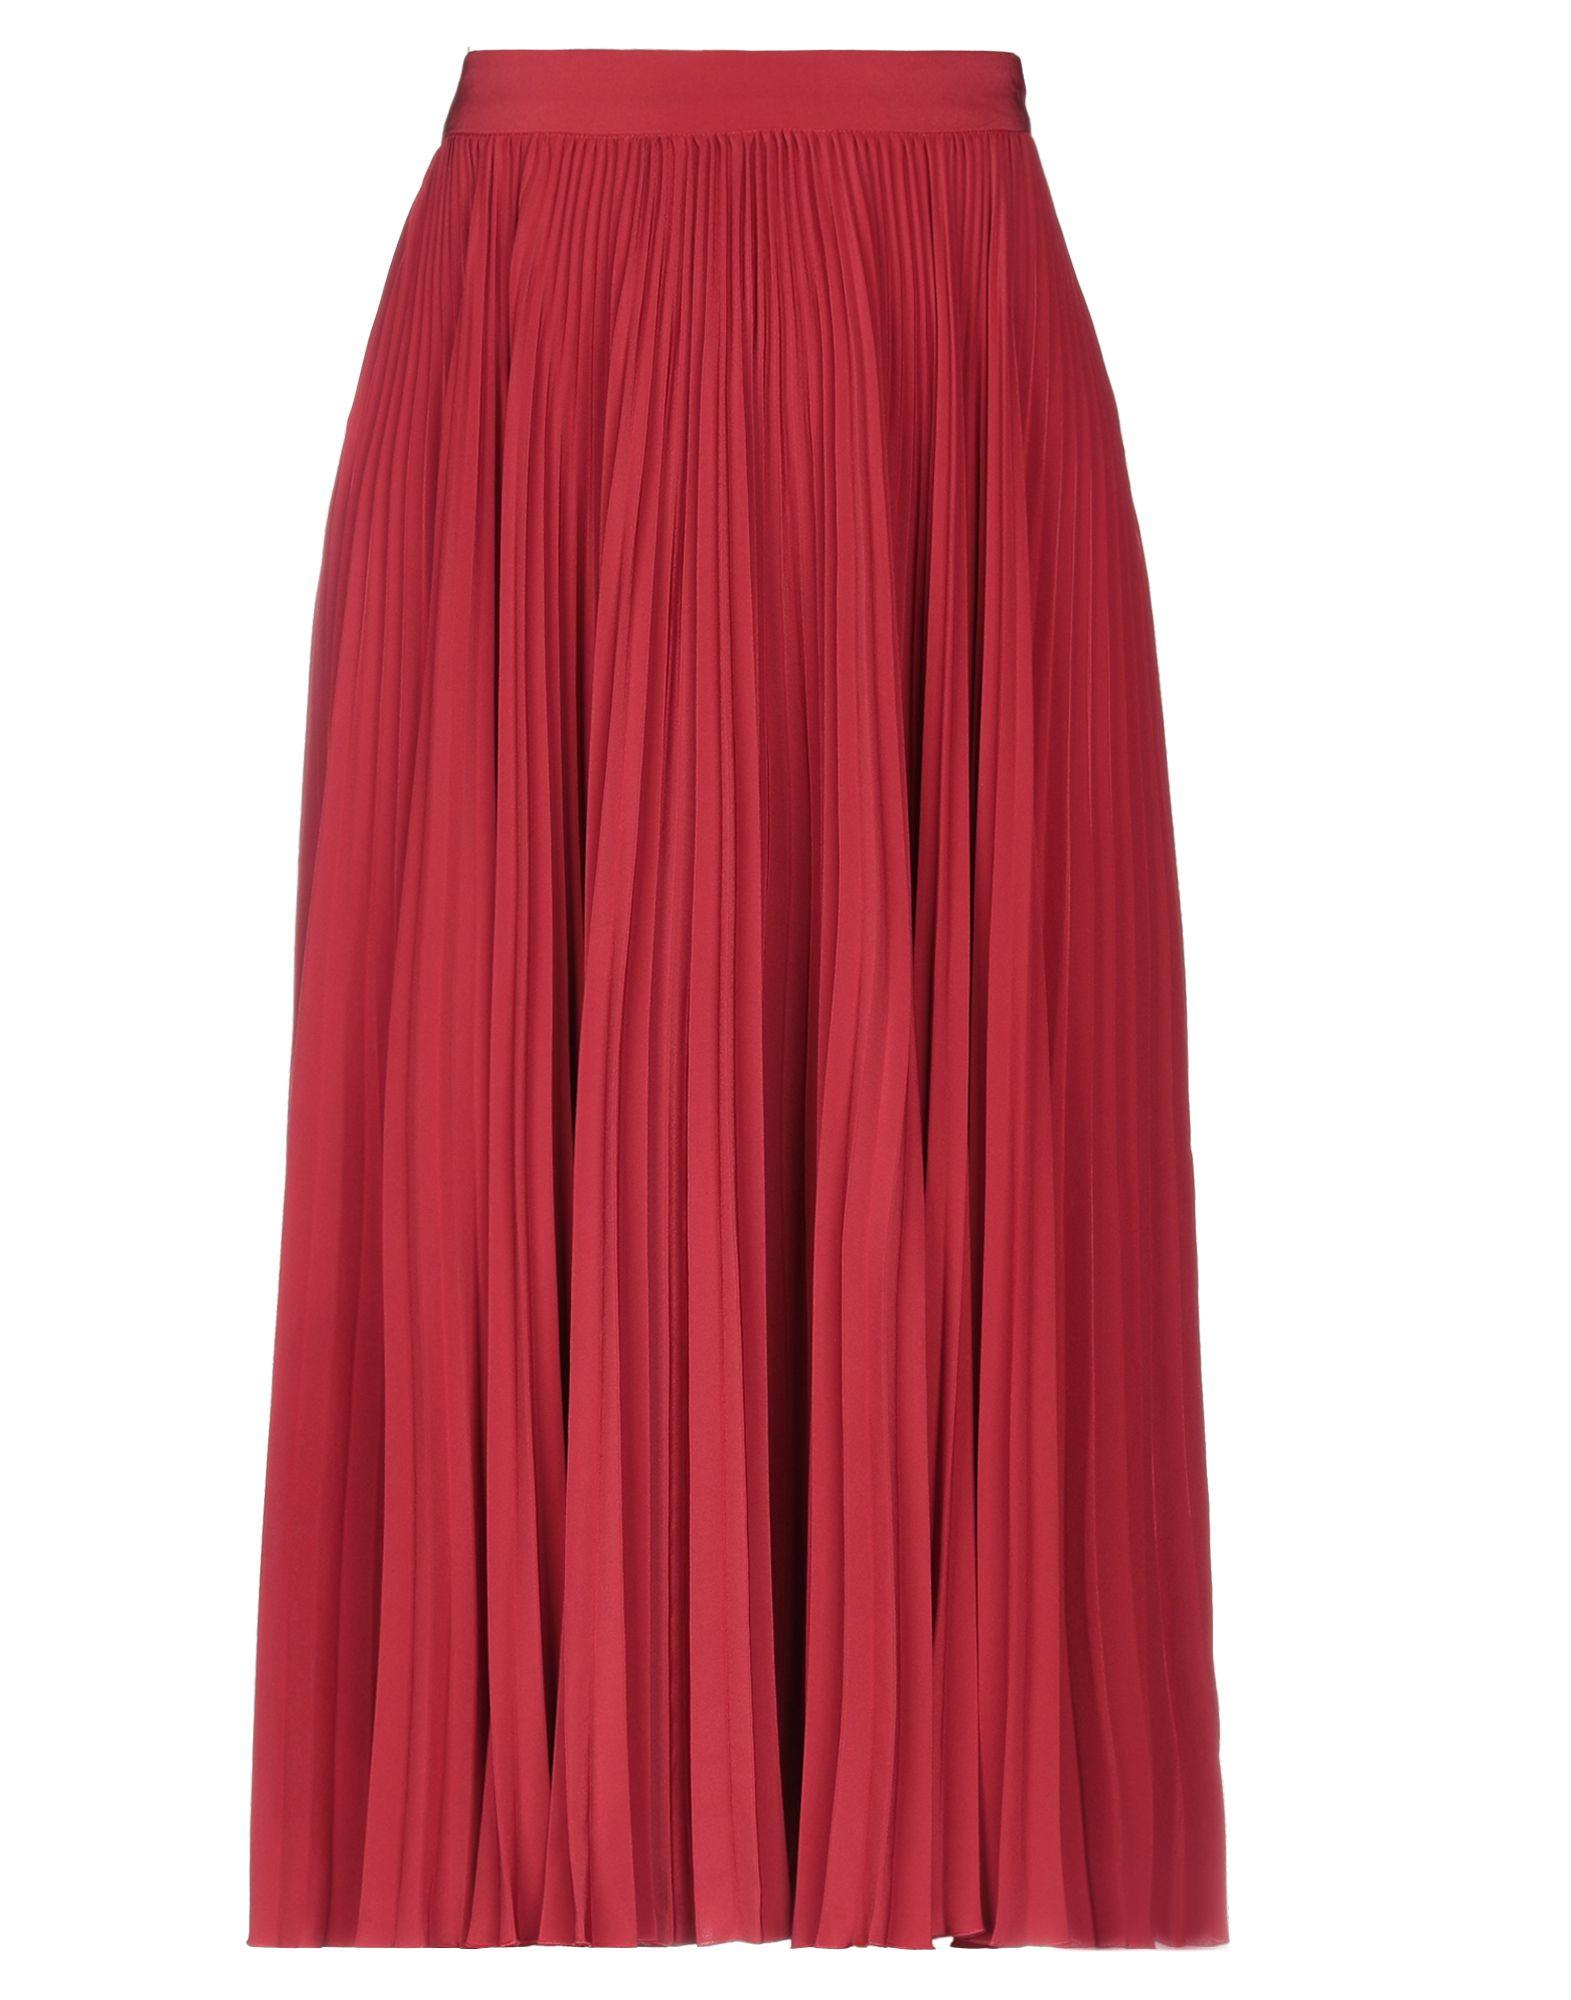 PHILOSOPHY di LORENZO SERAFINI 3/4 length skirts. plain weave, basic solid color, side closure, zipper closure, no pockets, no appliqués, unlined. 100% Polyester